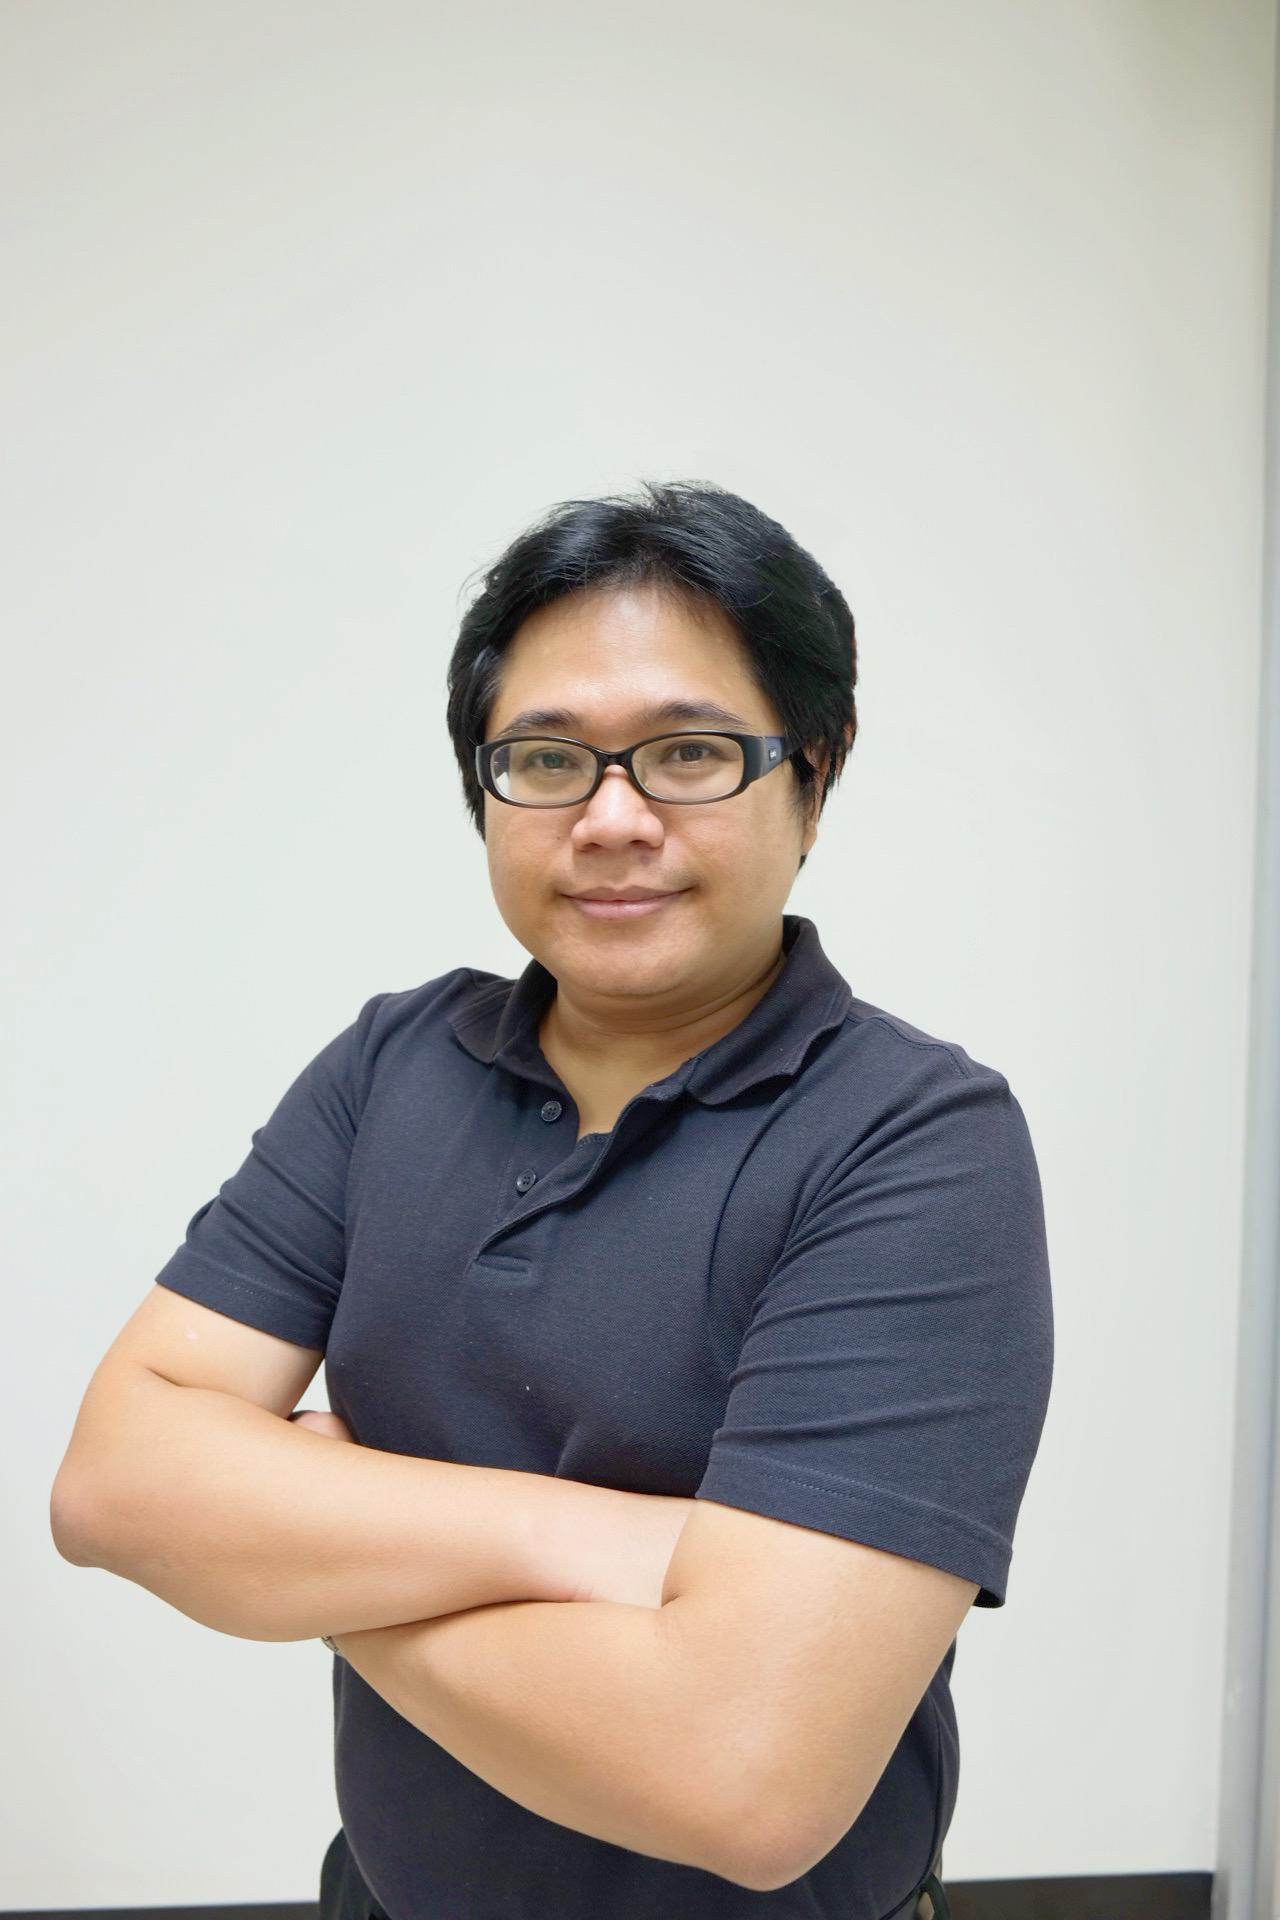 Boyd, Ph.D. Chaichalit Srisawat